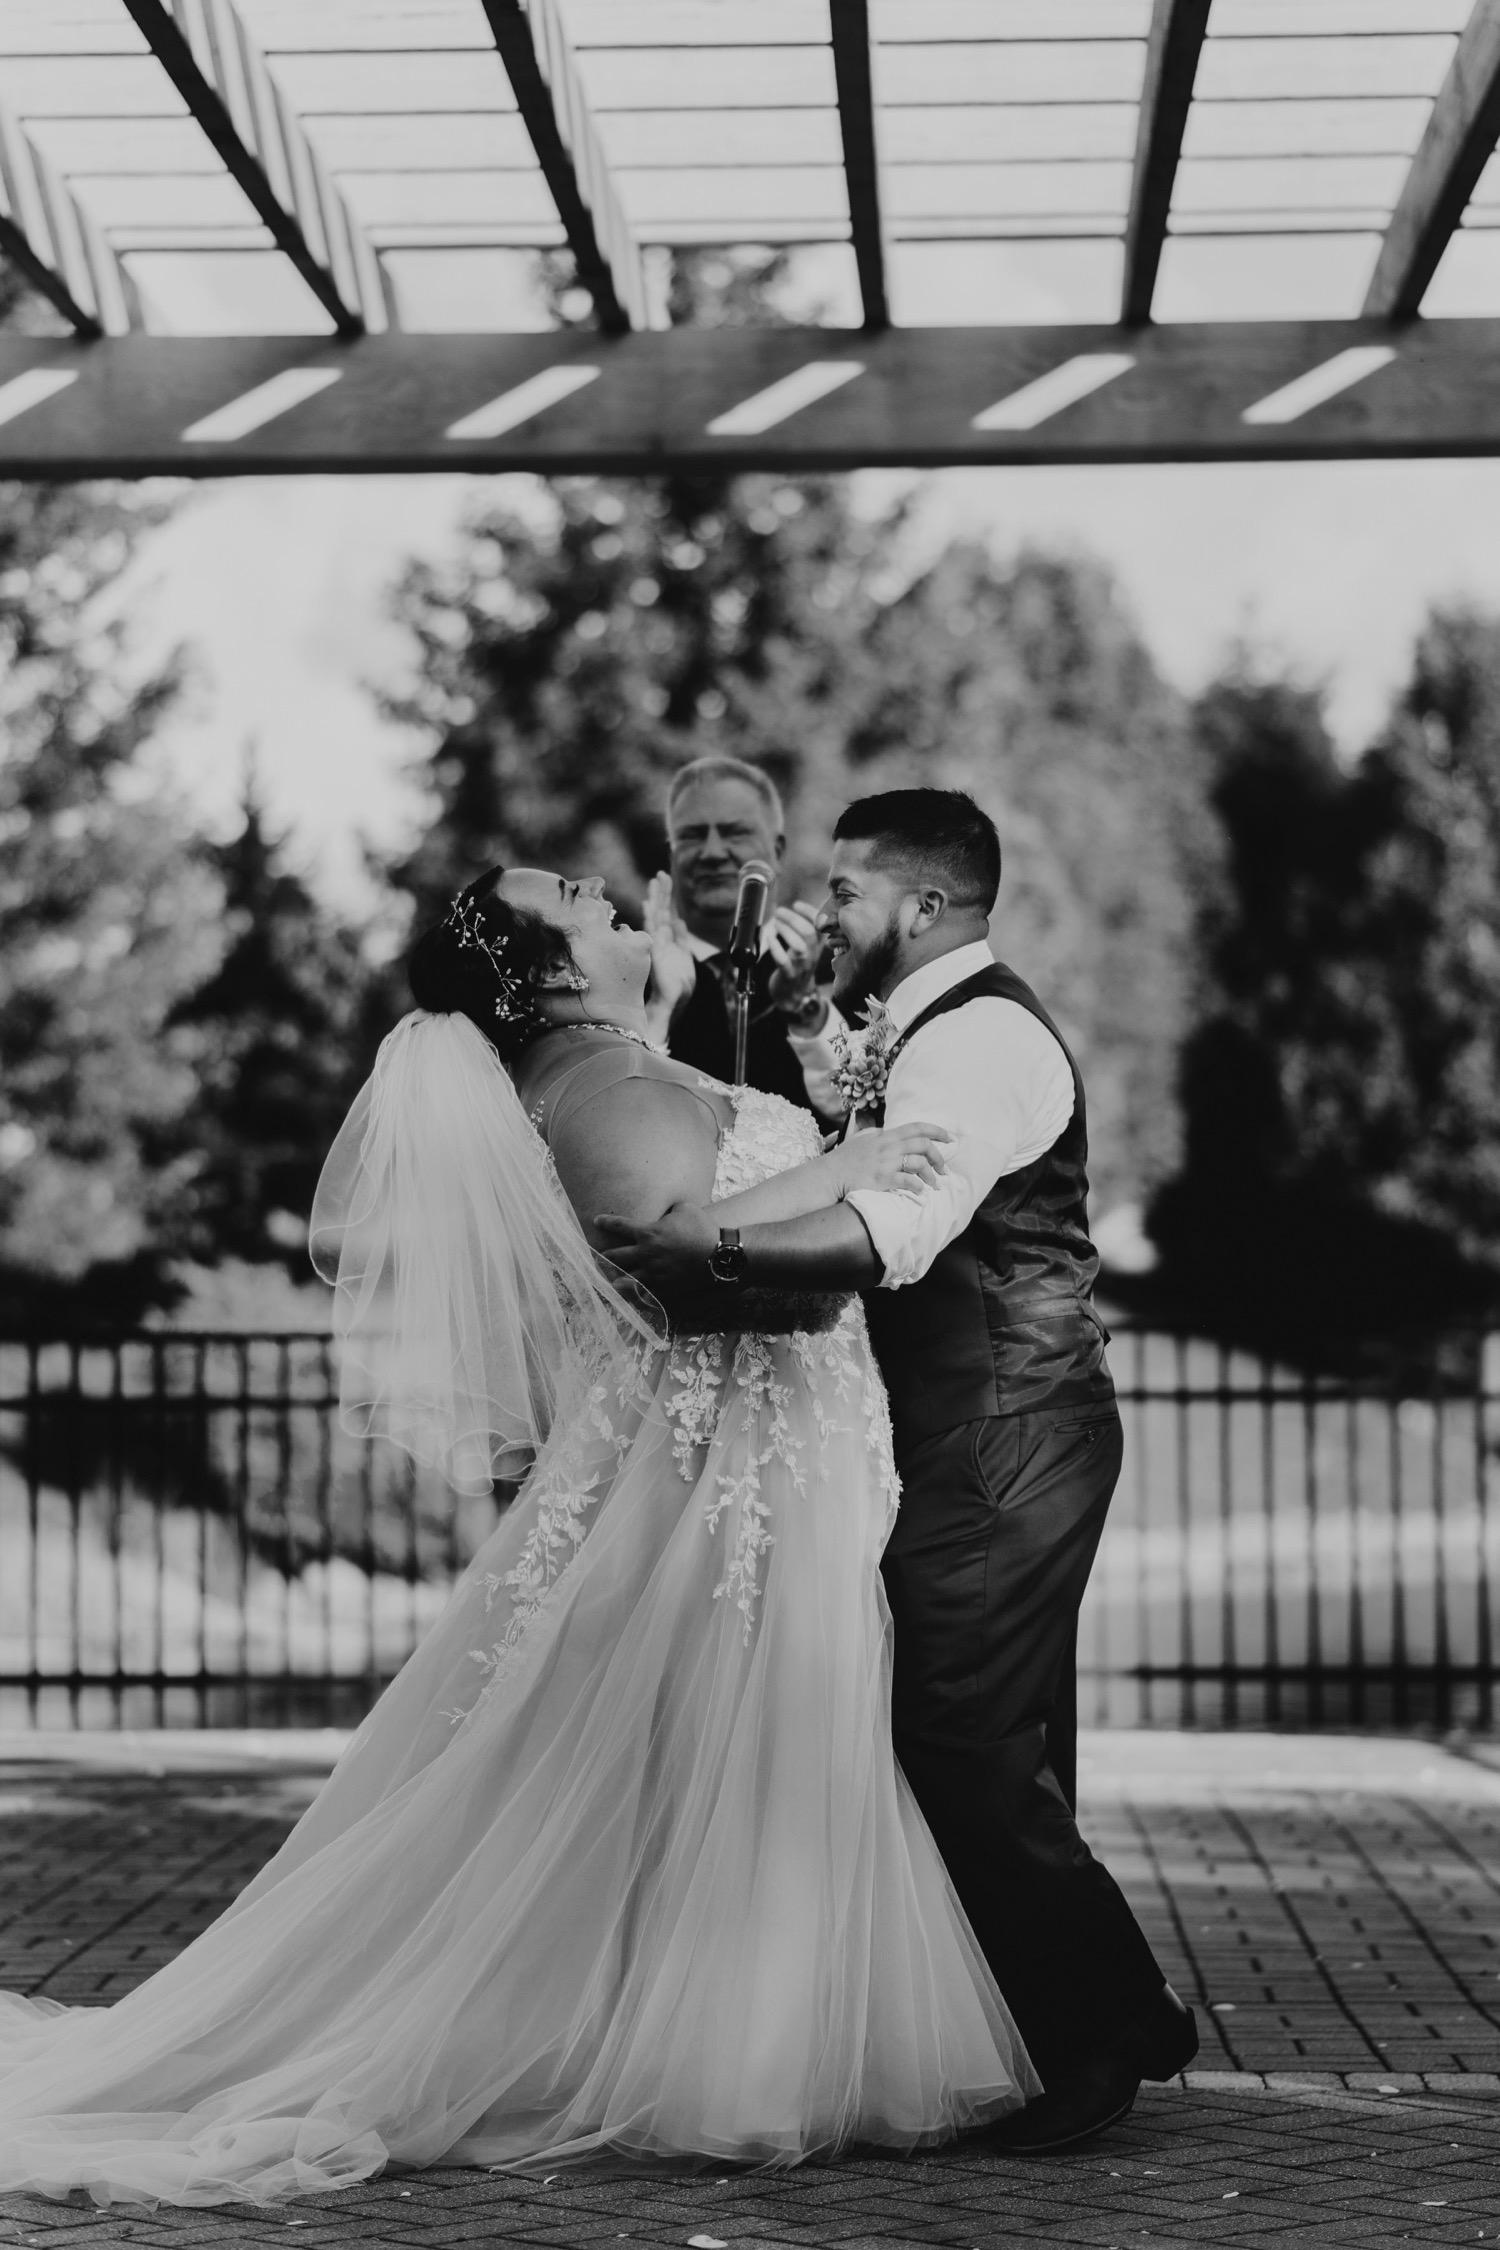 075_Gianpaolo-Vega-CDandMe-Frankfort-Wedding_0128.jpg